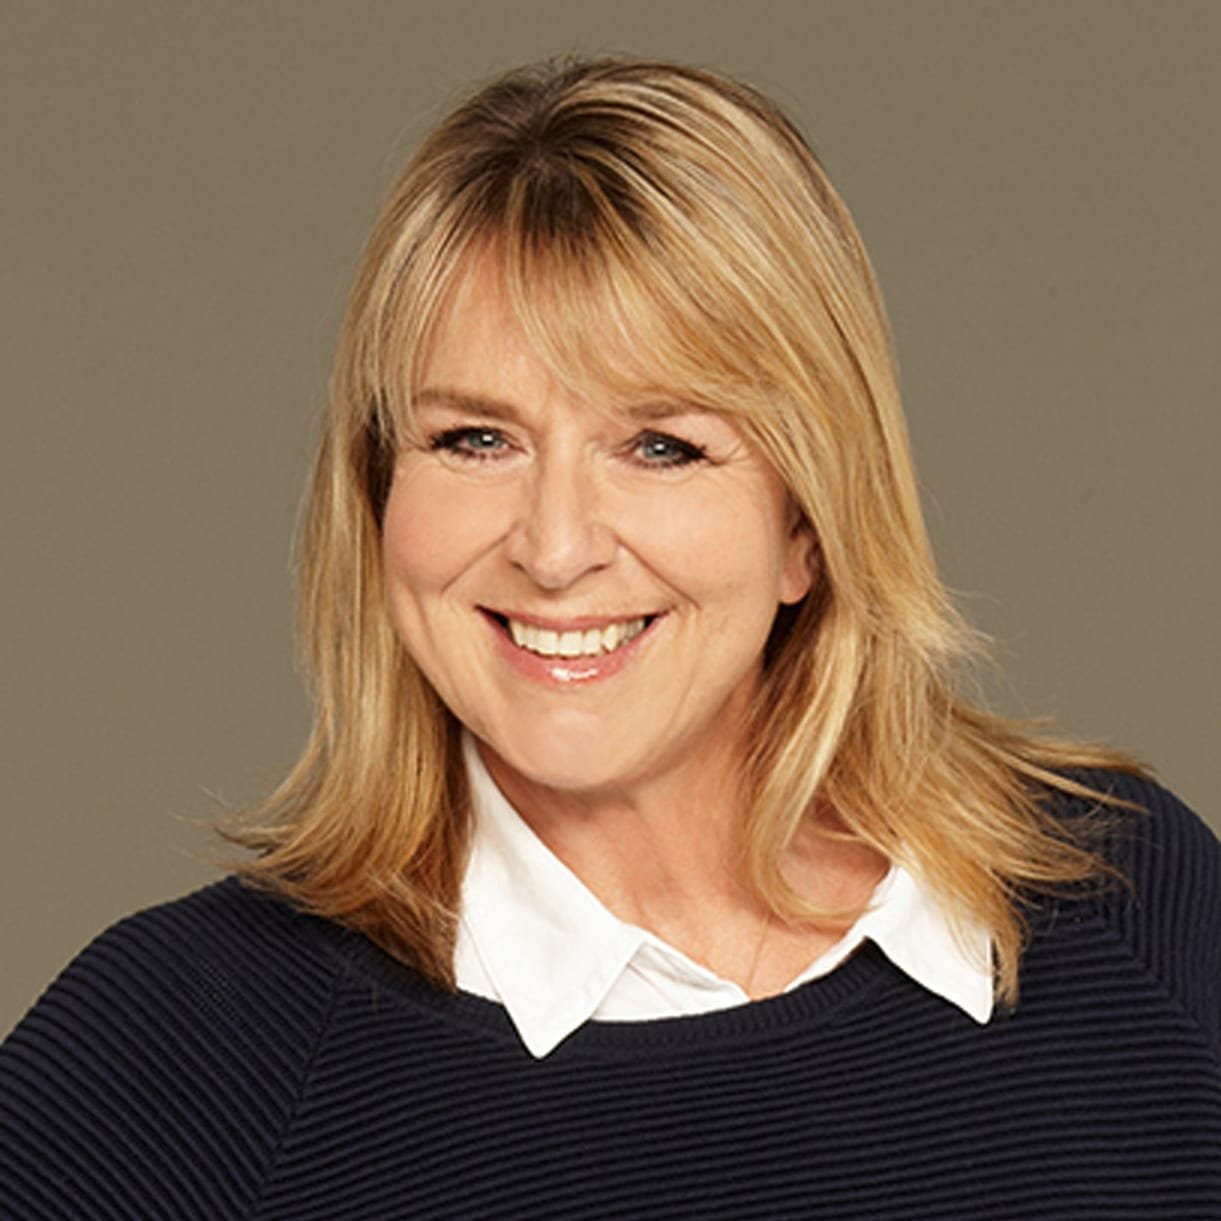 Fern-Britton-Presenter-broadcaster-awards-TV-host-at-Great-British-Speakers